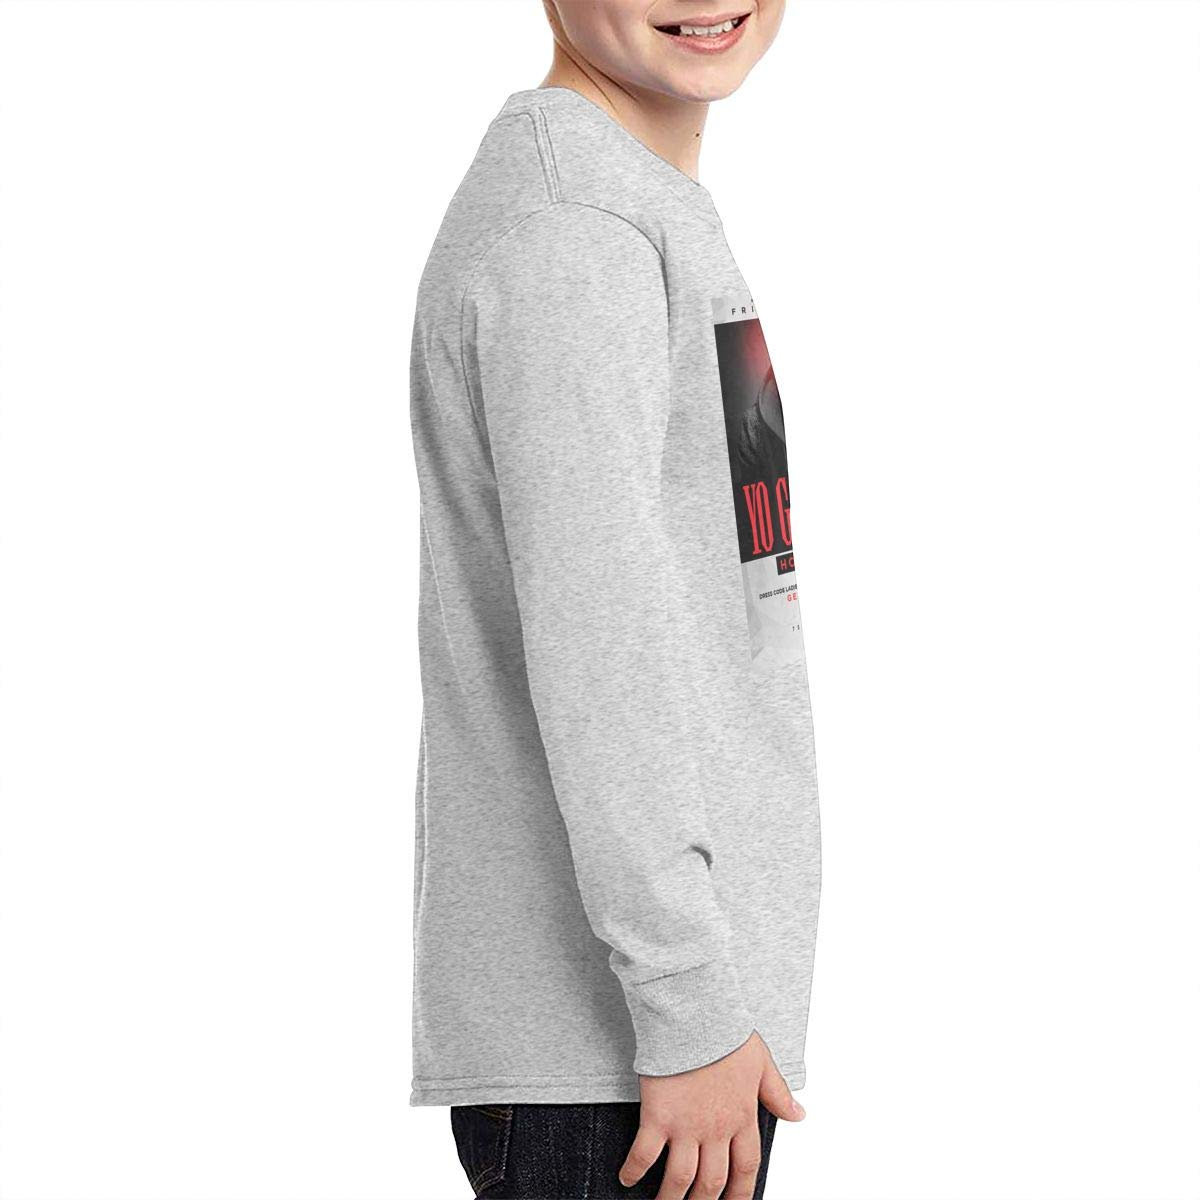 TWOSKILL Youth Yo-Gotti Long Sleeves Shirt Boys Girls